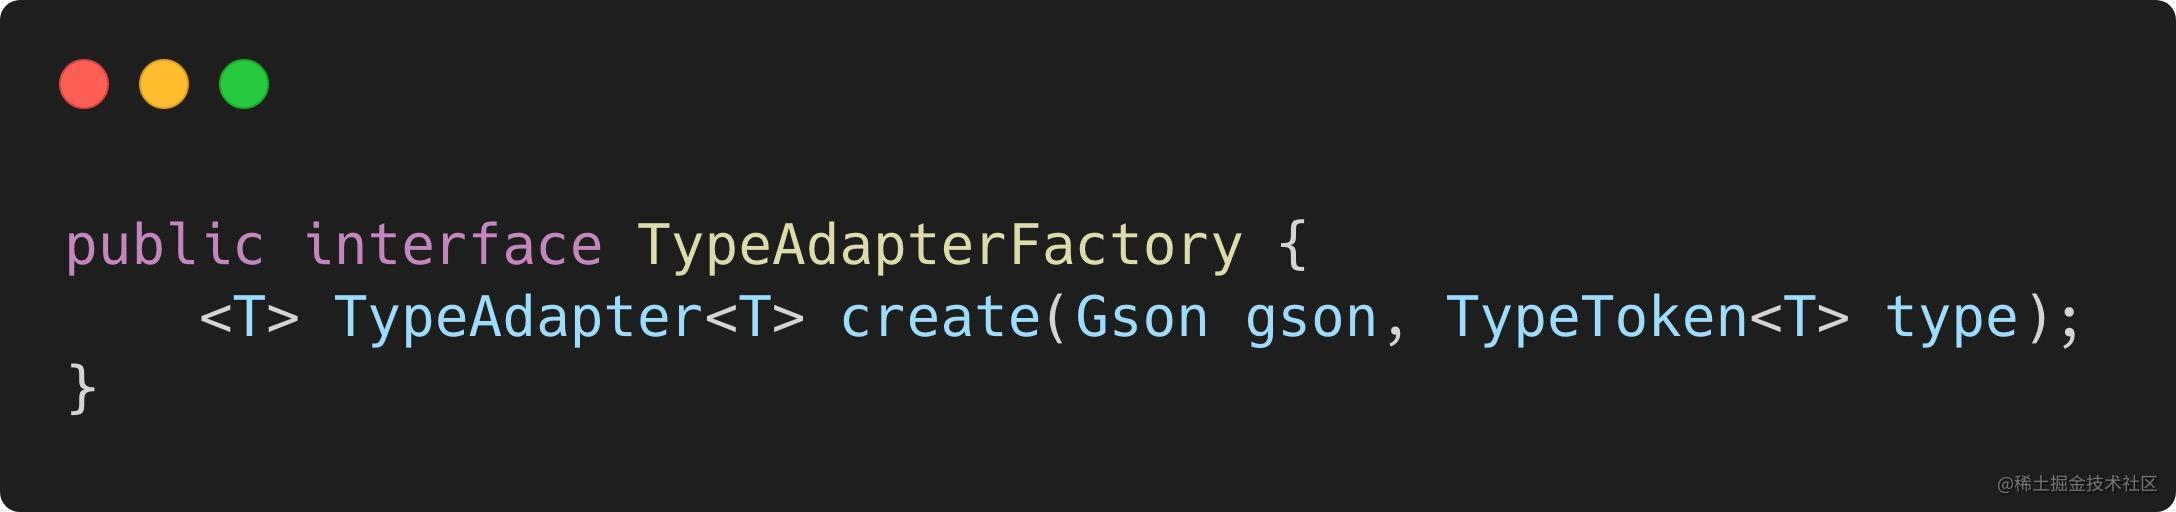 TypeAdapterFactory代码.jpeg